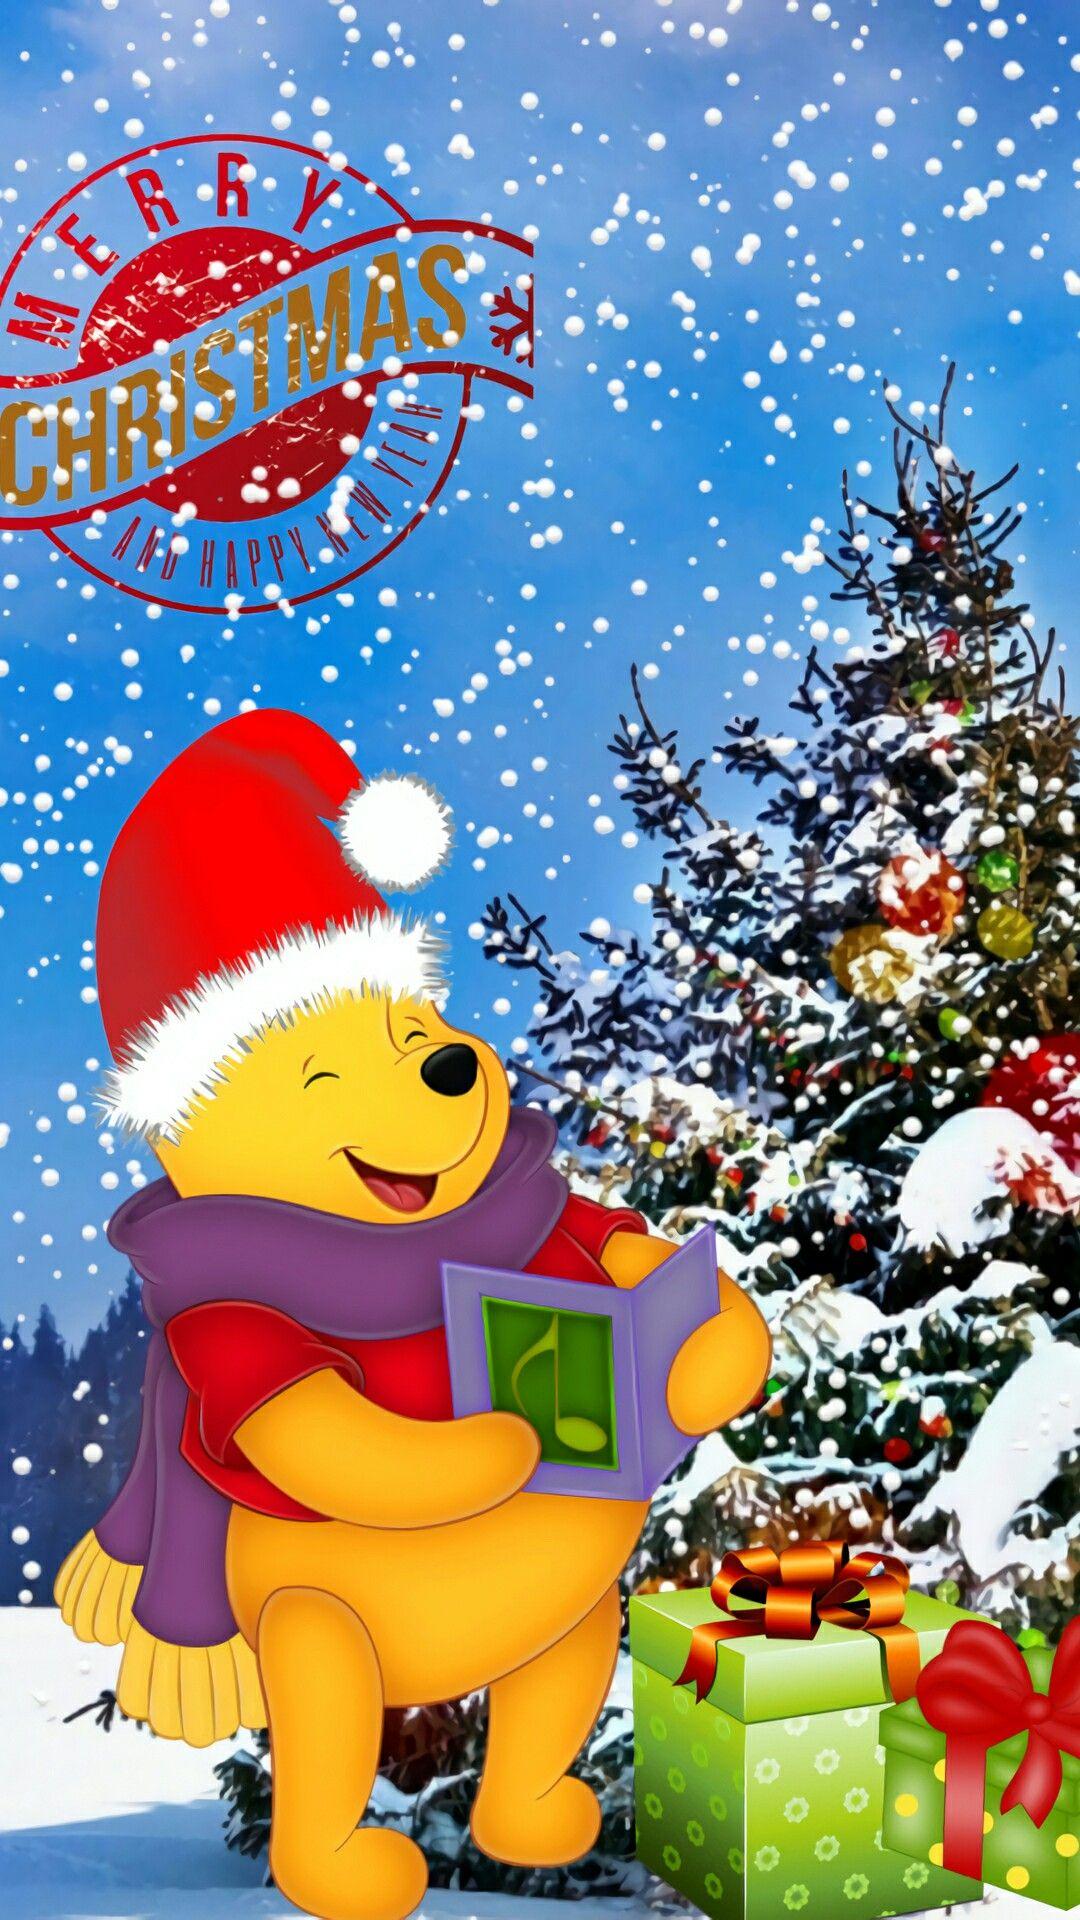 Merry Christmas Winnie The Pooh Christmas